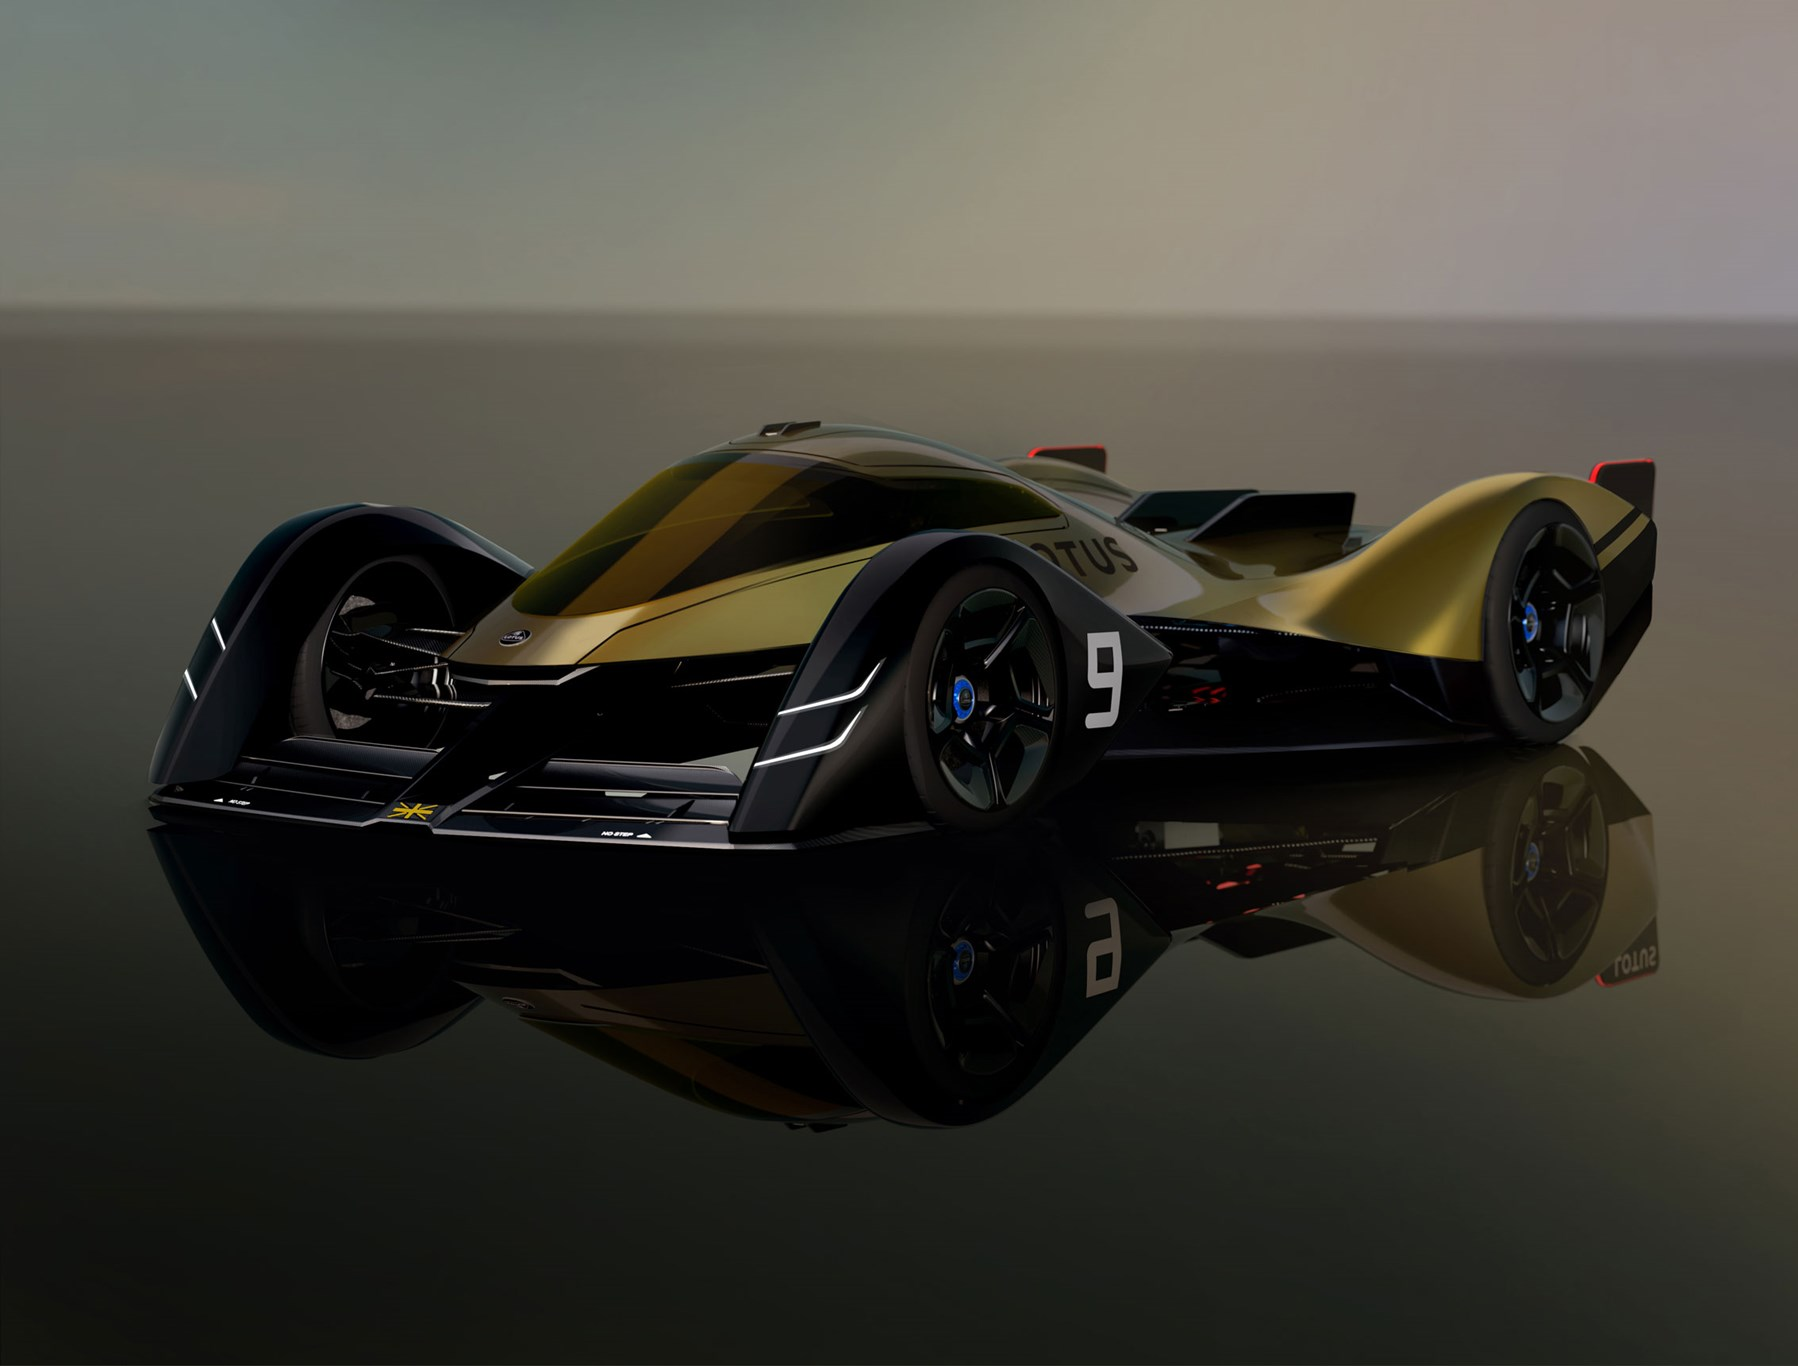 Lotus E-R9 Next Generation